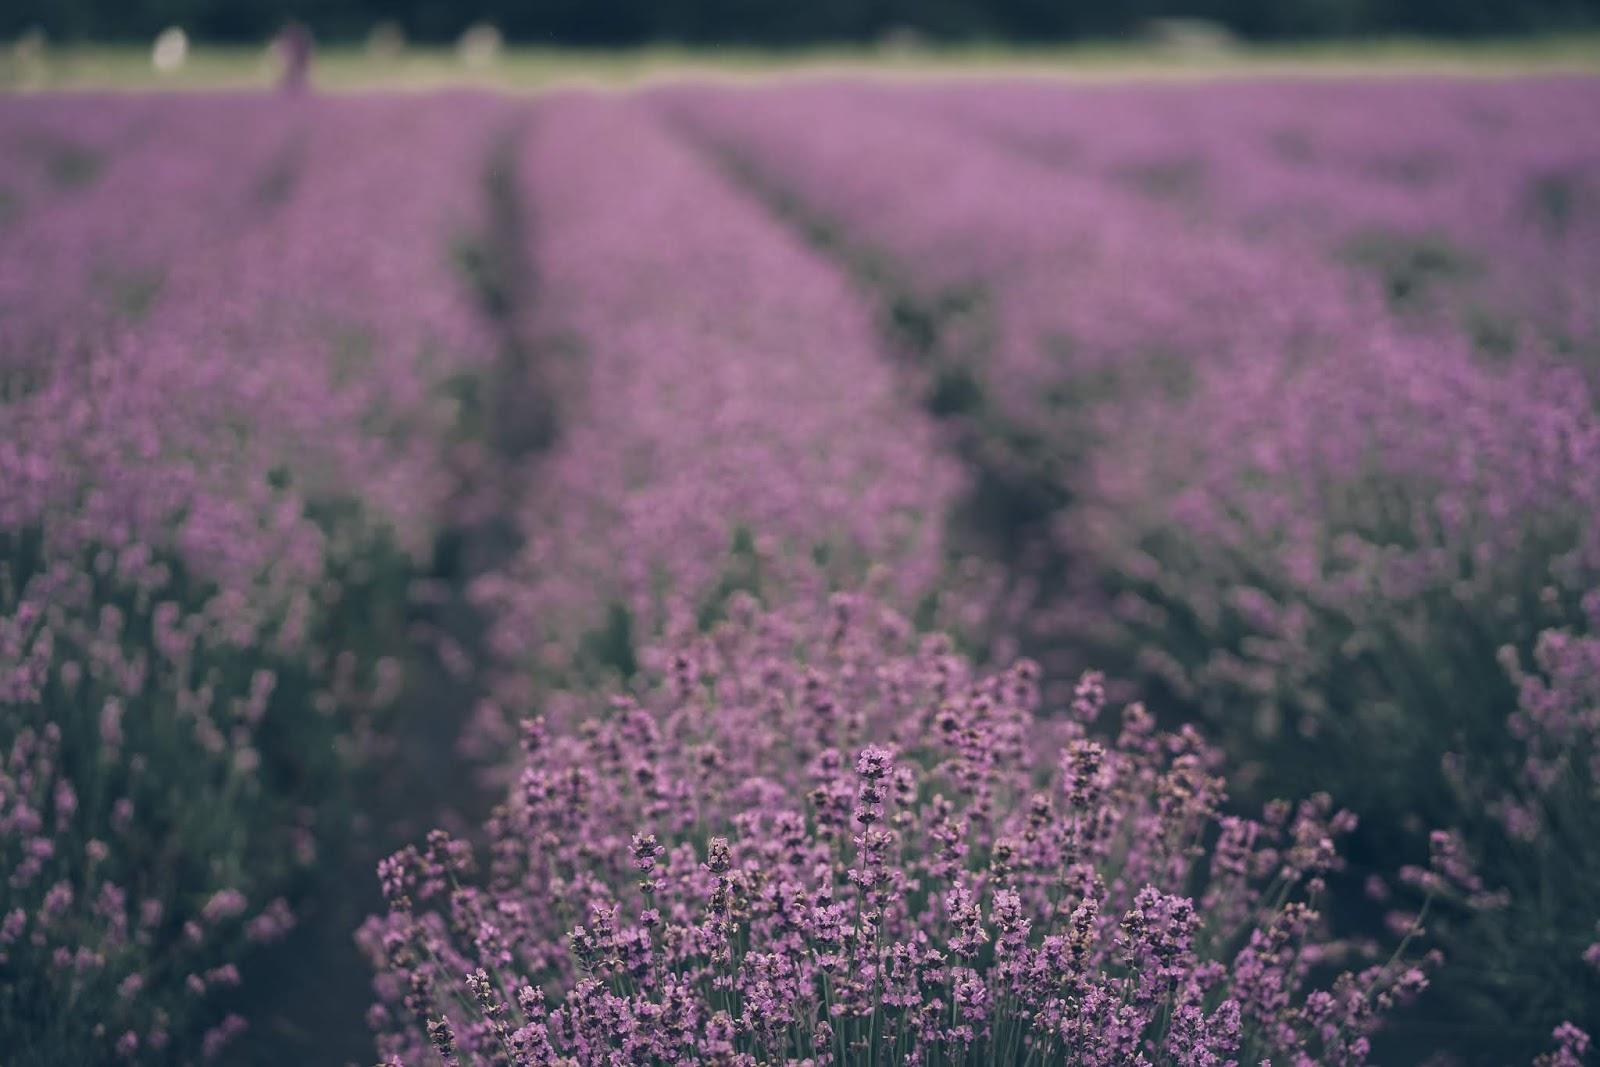 Hani Lavender Farm Festival 2019 - 하늬라벤더팜 축제 - Mini